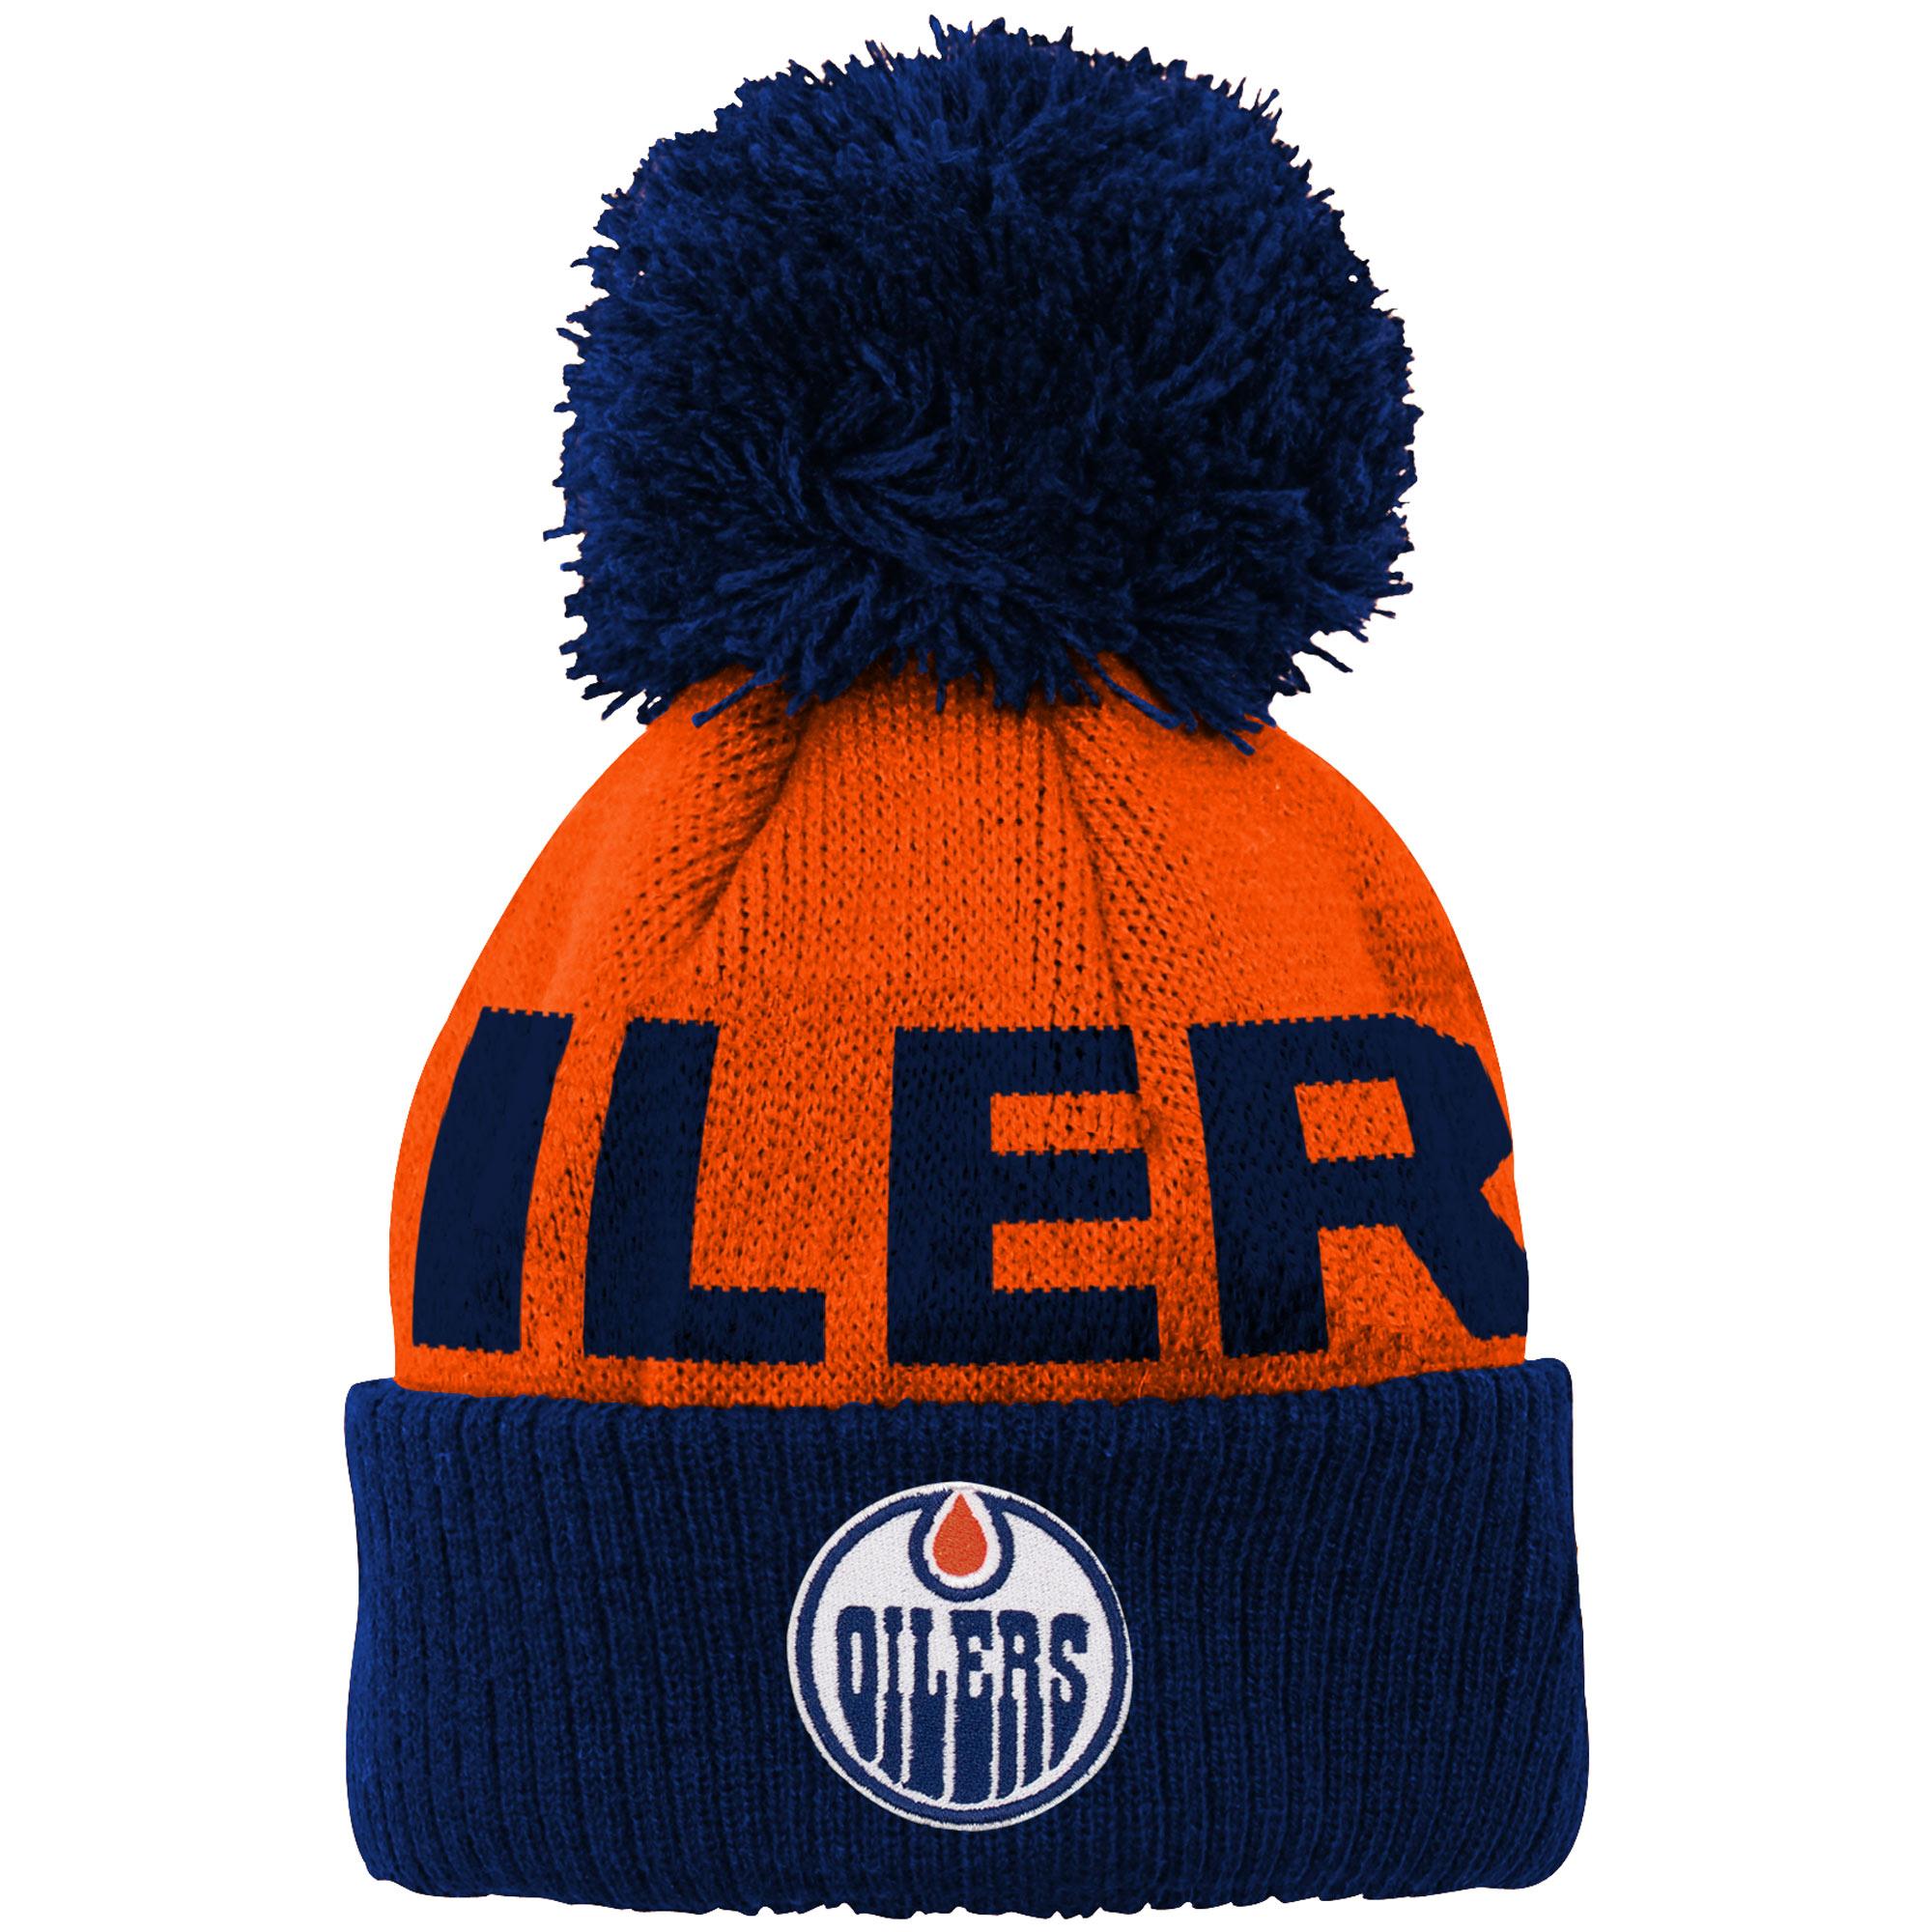 Edmonton Oilers Newborn & Infant Block Wordmark Cuffed Pom Knit Hat - Orange - OSFA